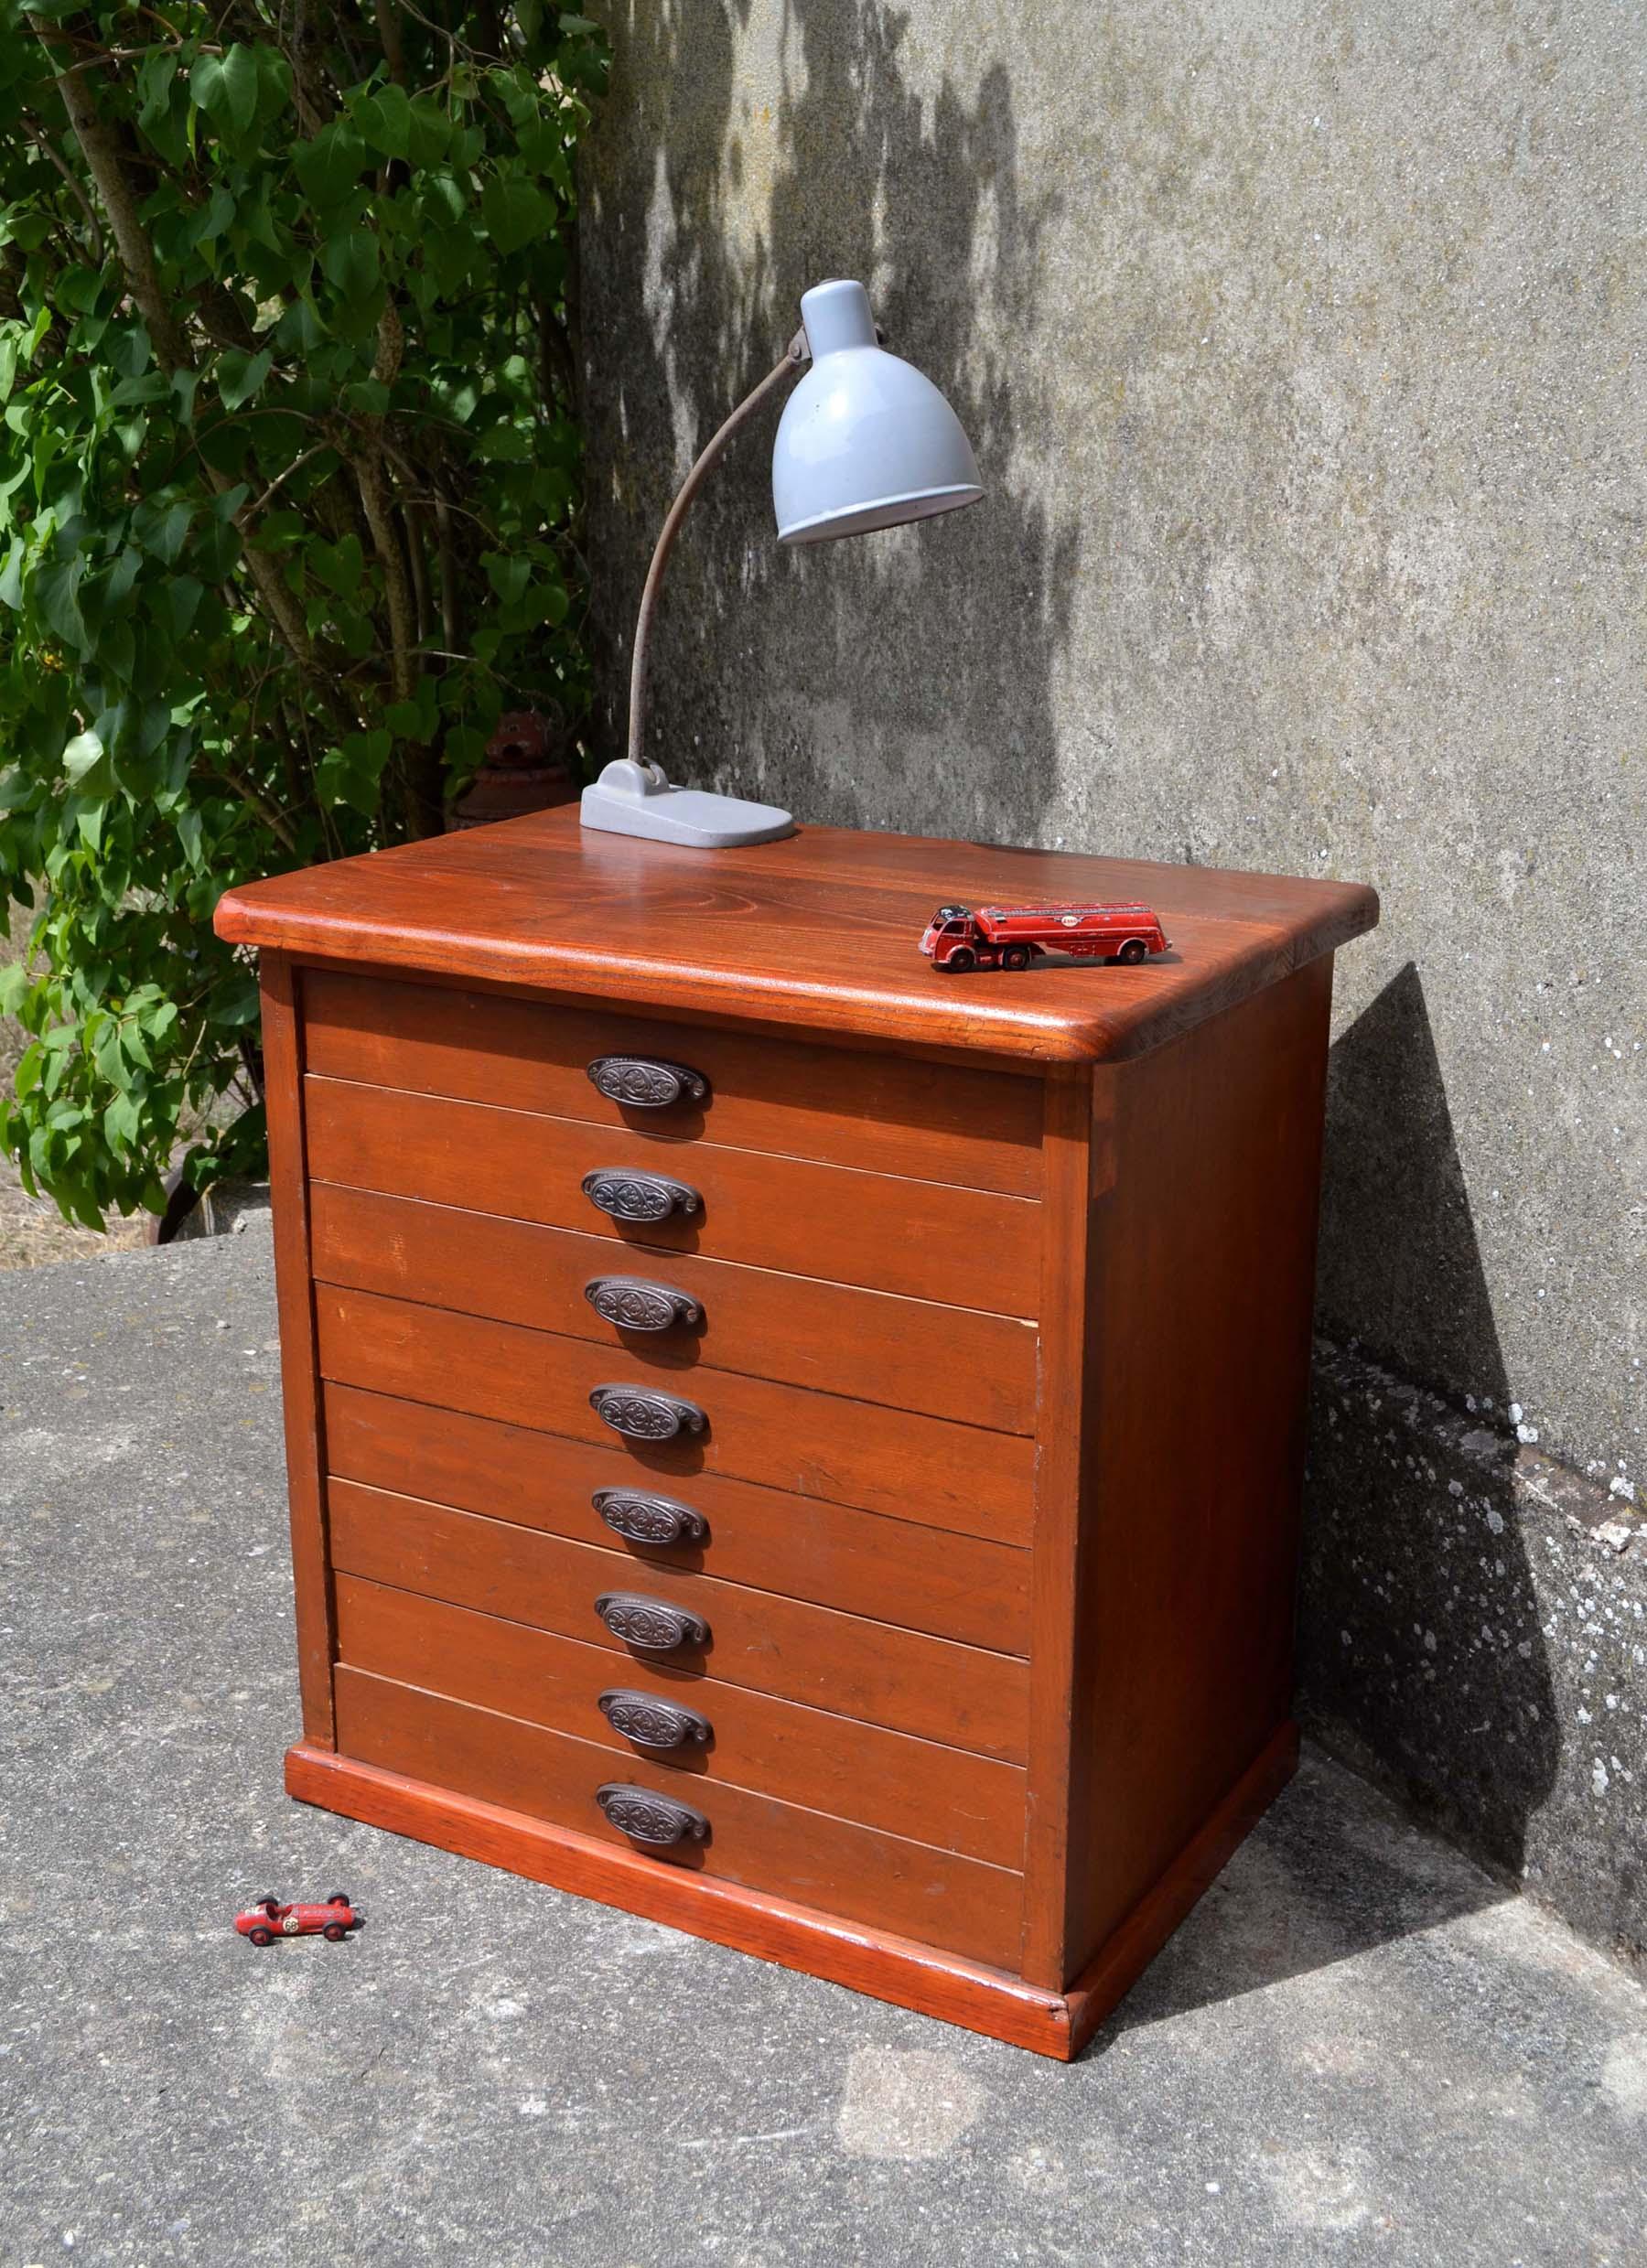 Mobilier industriel ancien chaises meubles tiroirs for Meuble a tiroir ancien